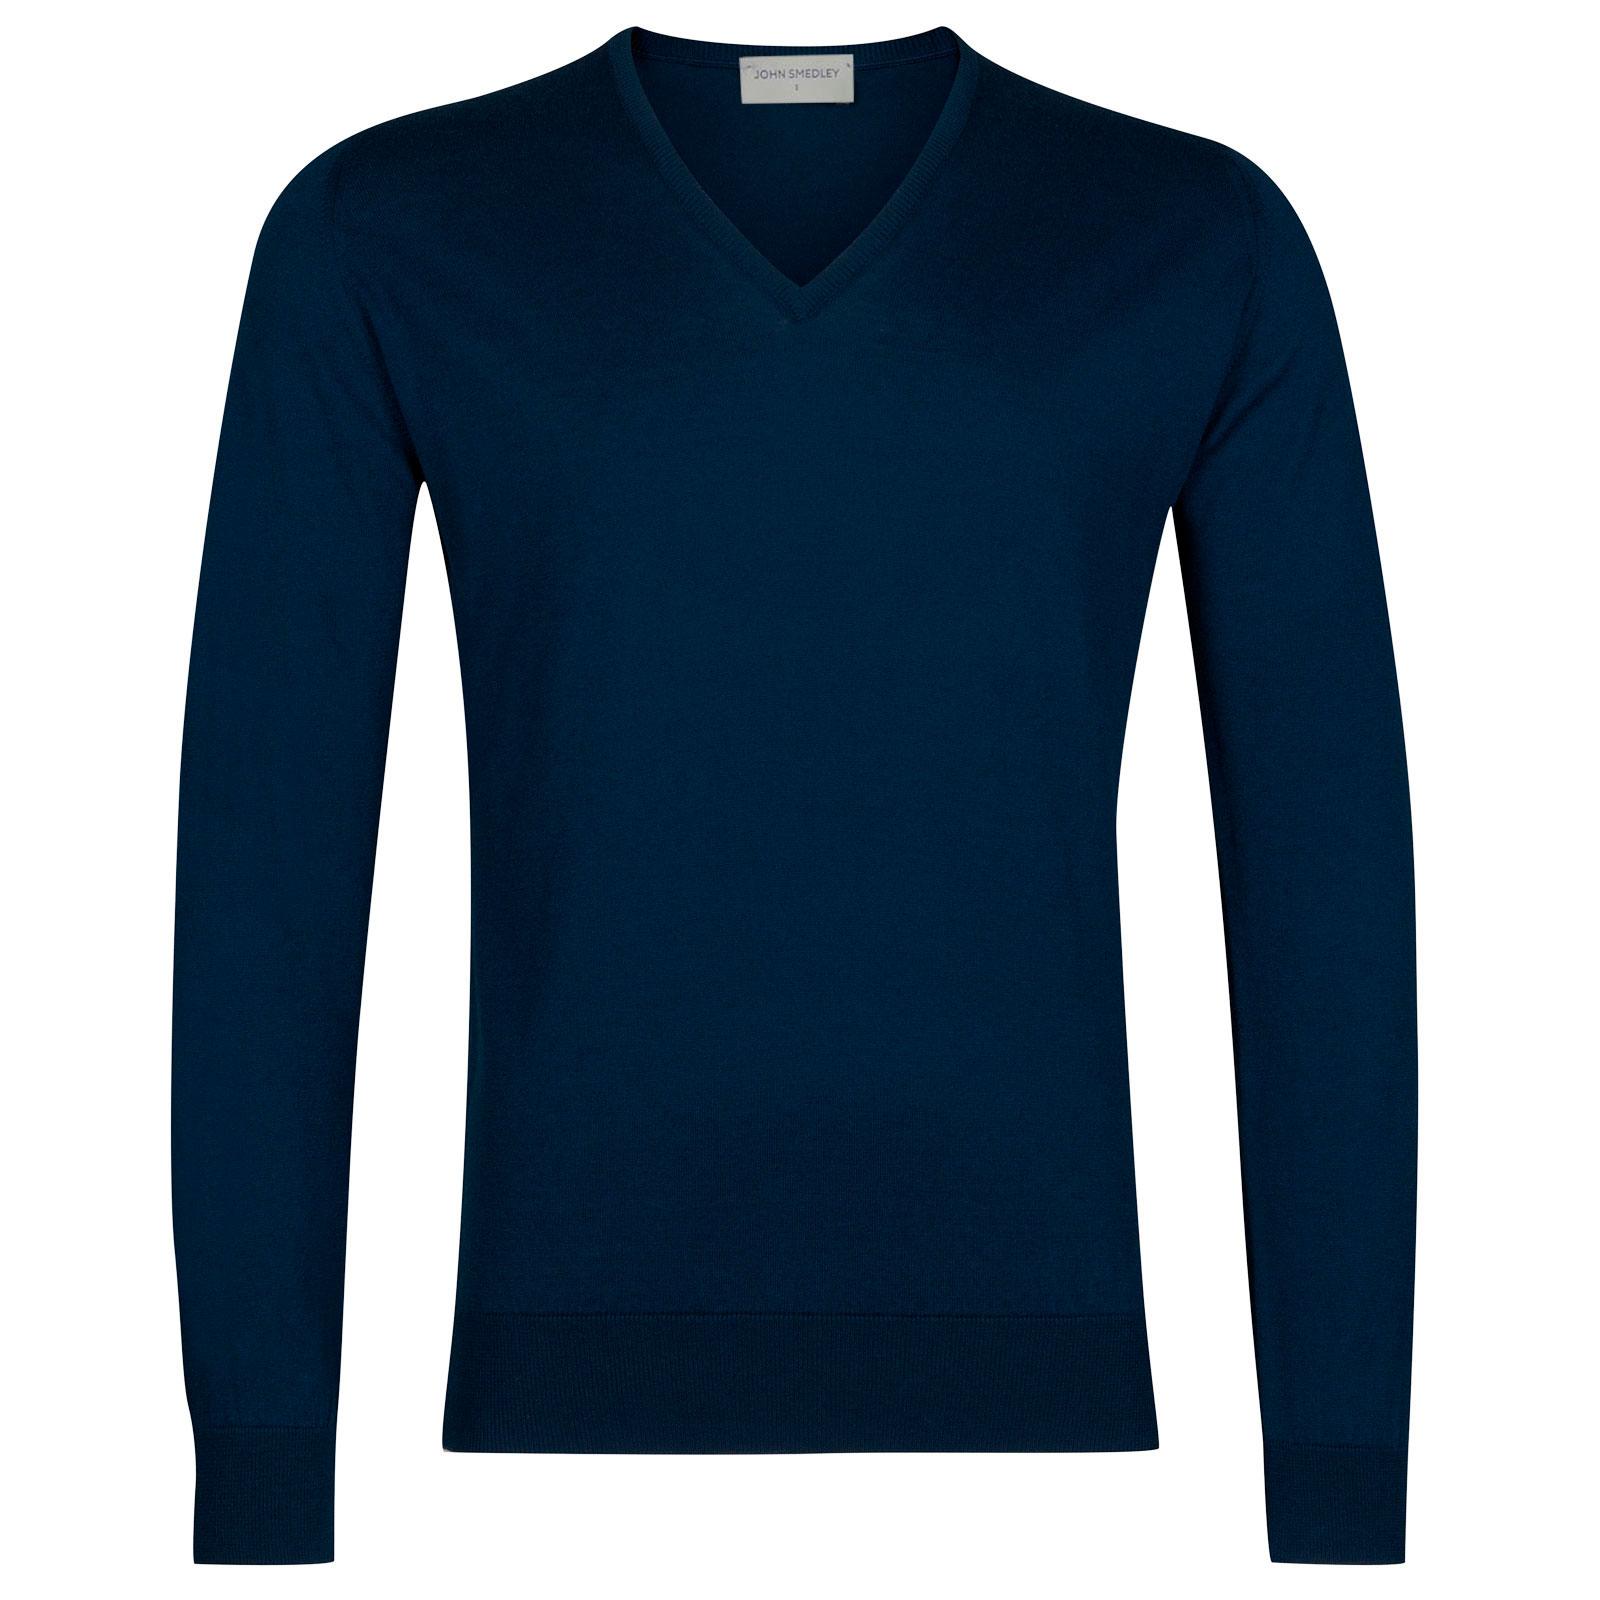 John Smedley Woburn Sea Island Cotton Pullover in Indigo-XL